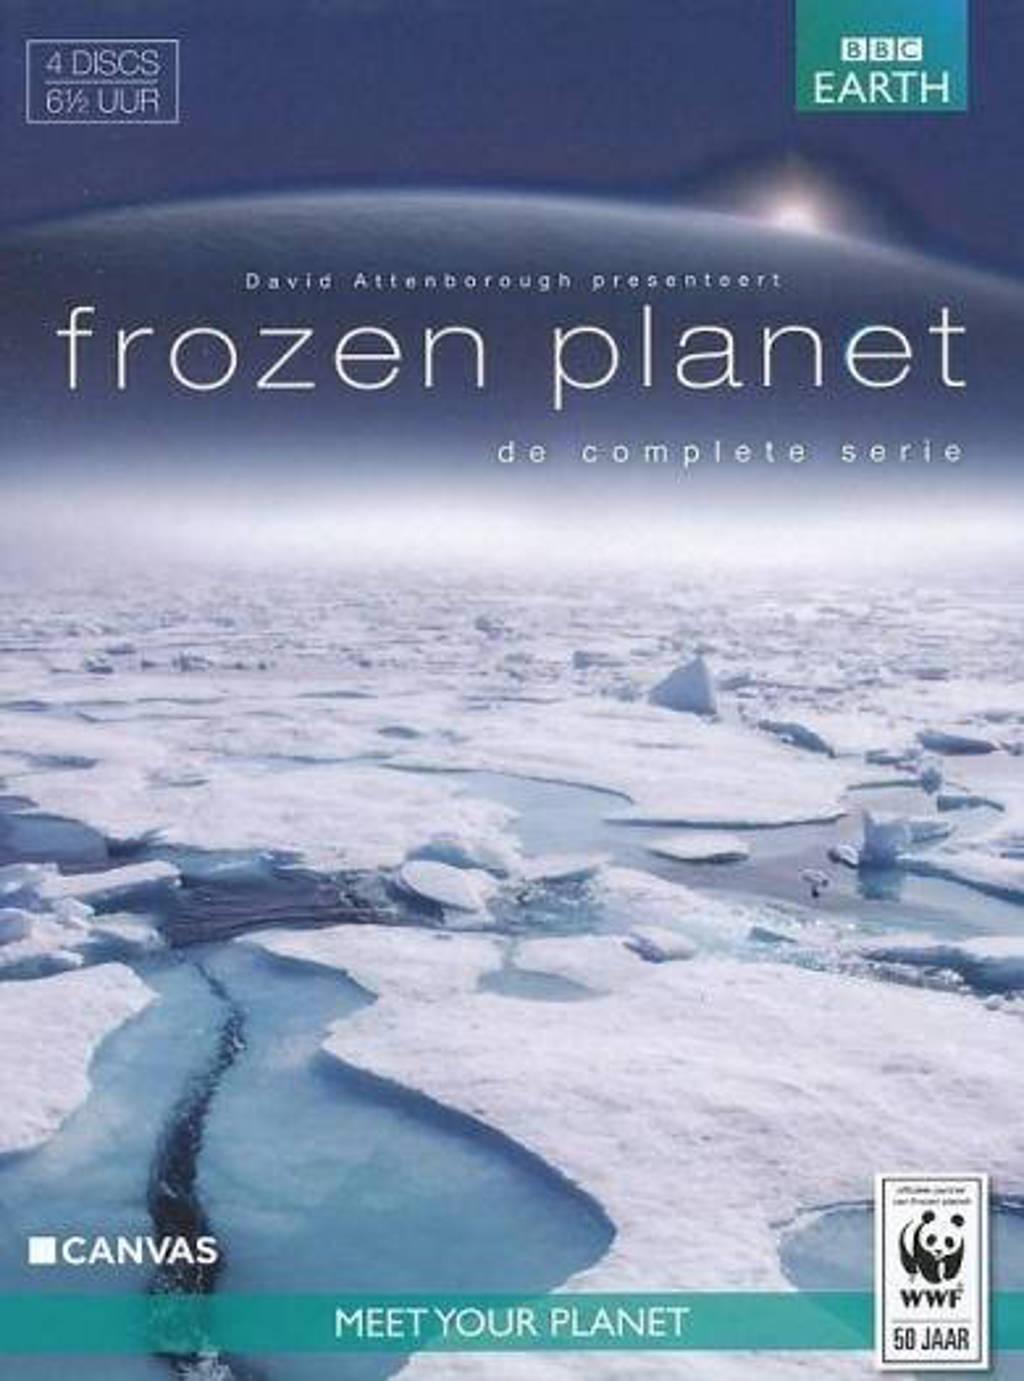 BBC earth - Frozen planet (DVD)